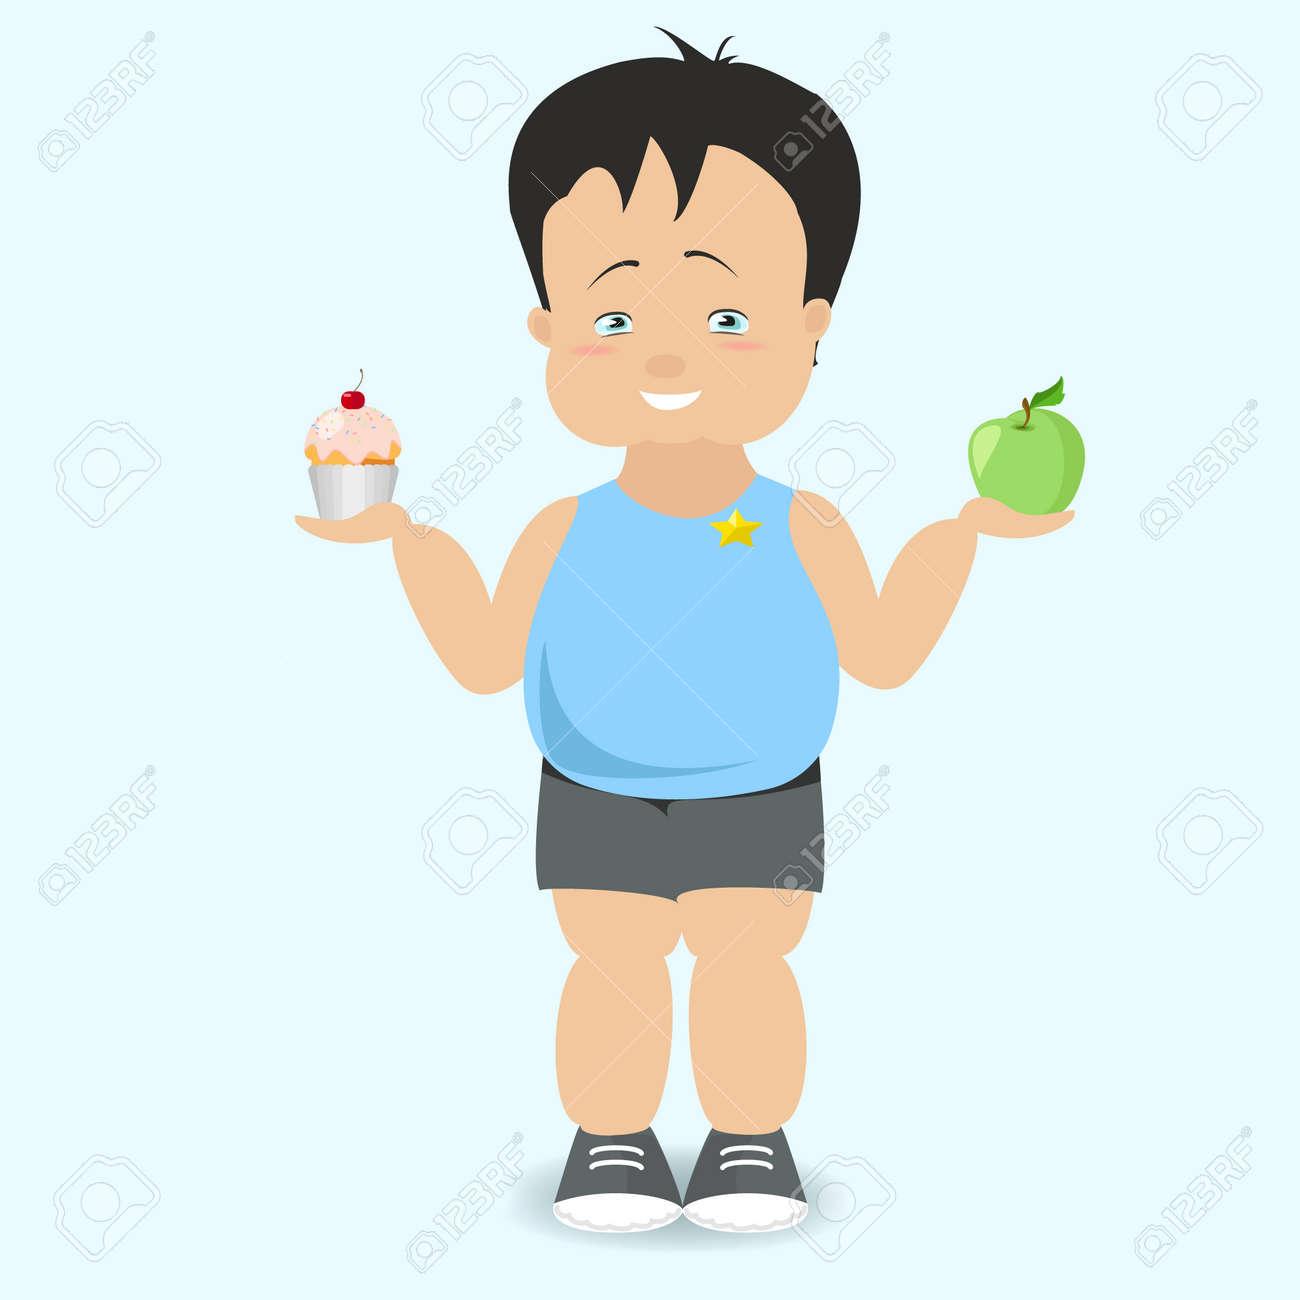 The boy chooses a healthy lifestyle. The fat kid. Vector cartoon - 67379891